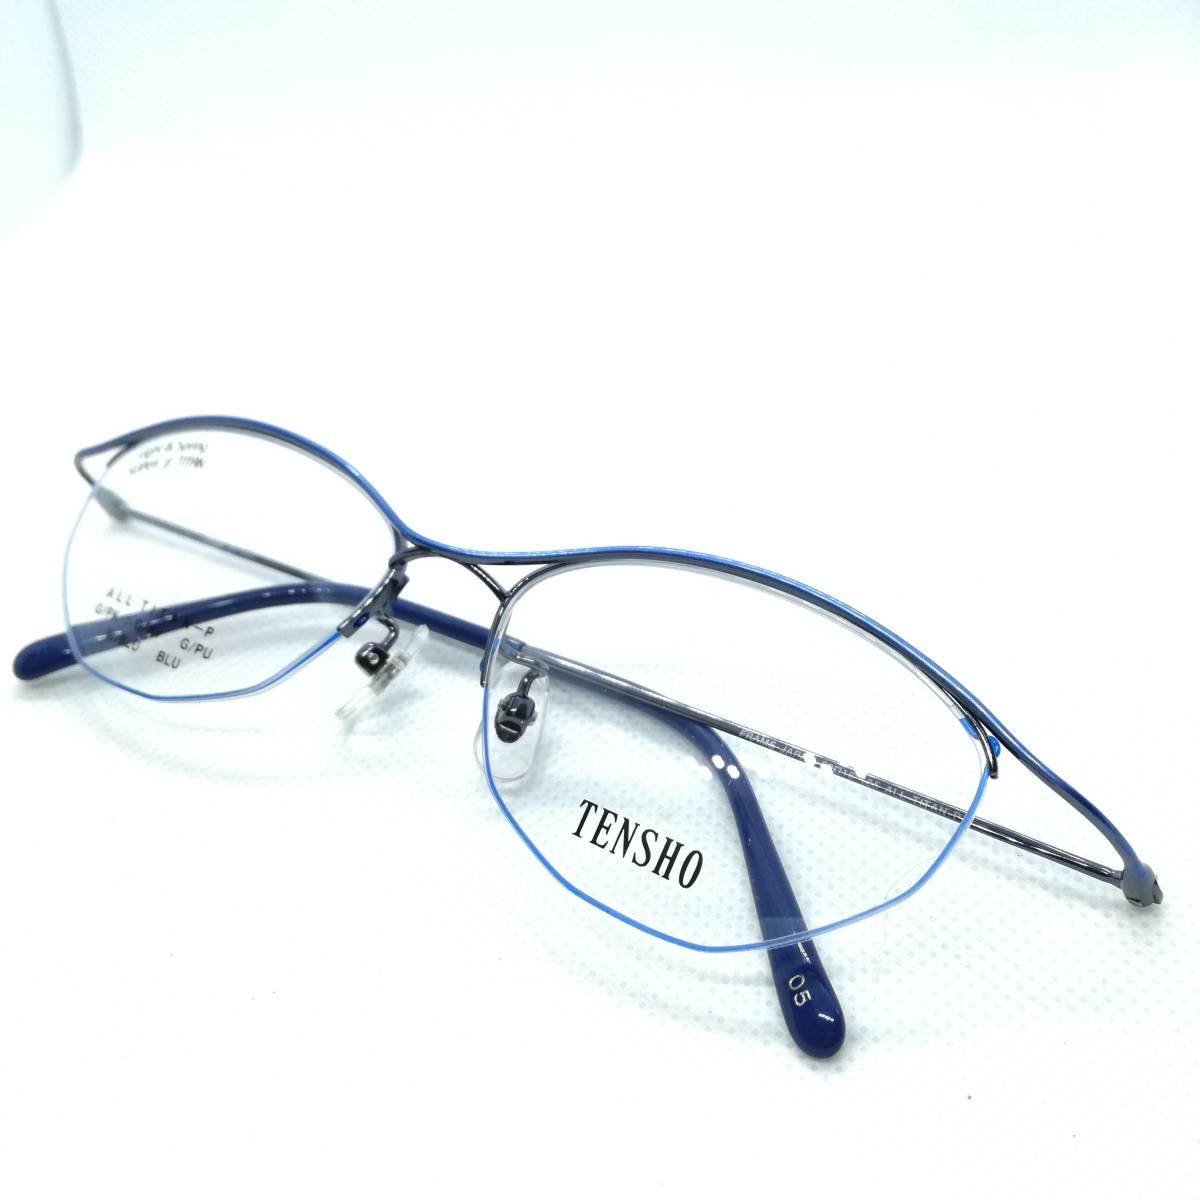 46ab4382bfd4 505 新品 メガネフレーム 眼鏡 めがね 日本製 made in japan チタン フルリム オーバル型 青